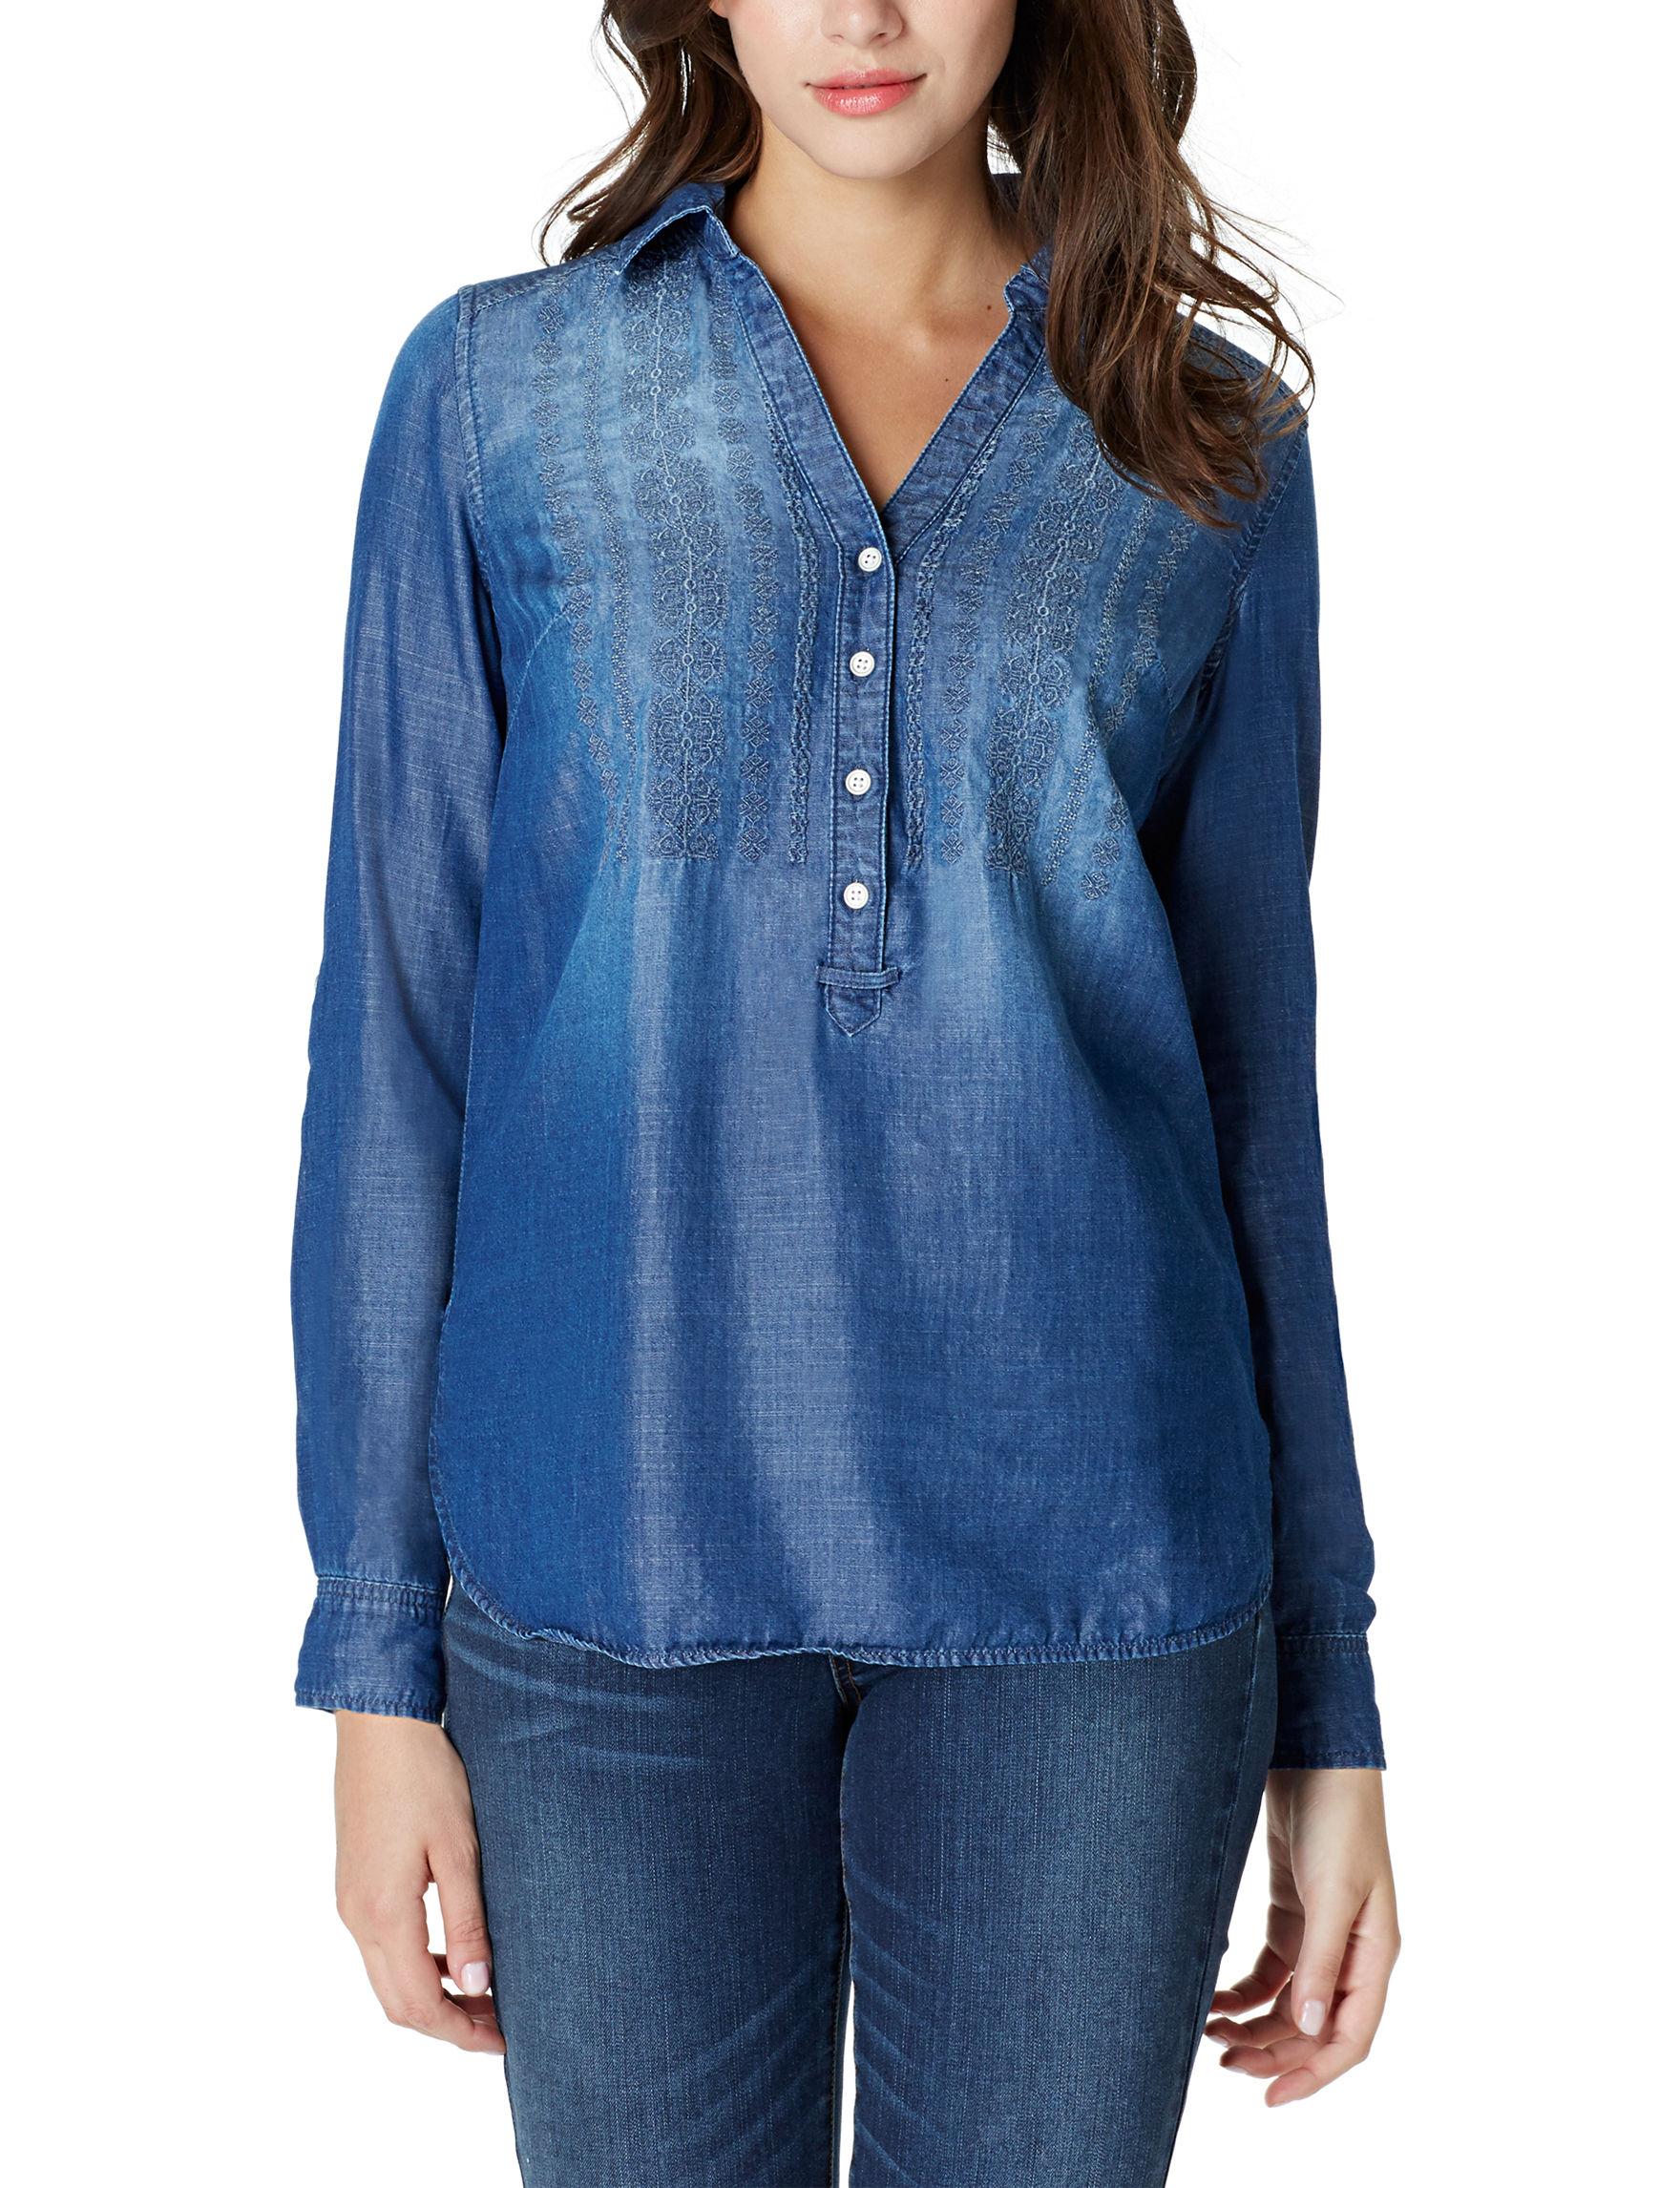 Vintage America Blues Blue Shirts & Blouses